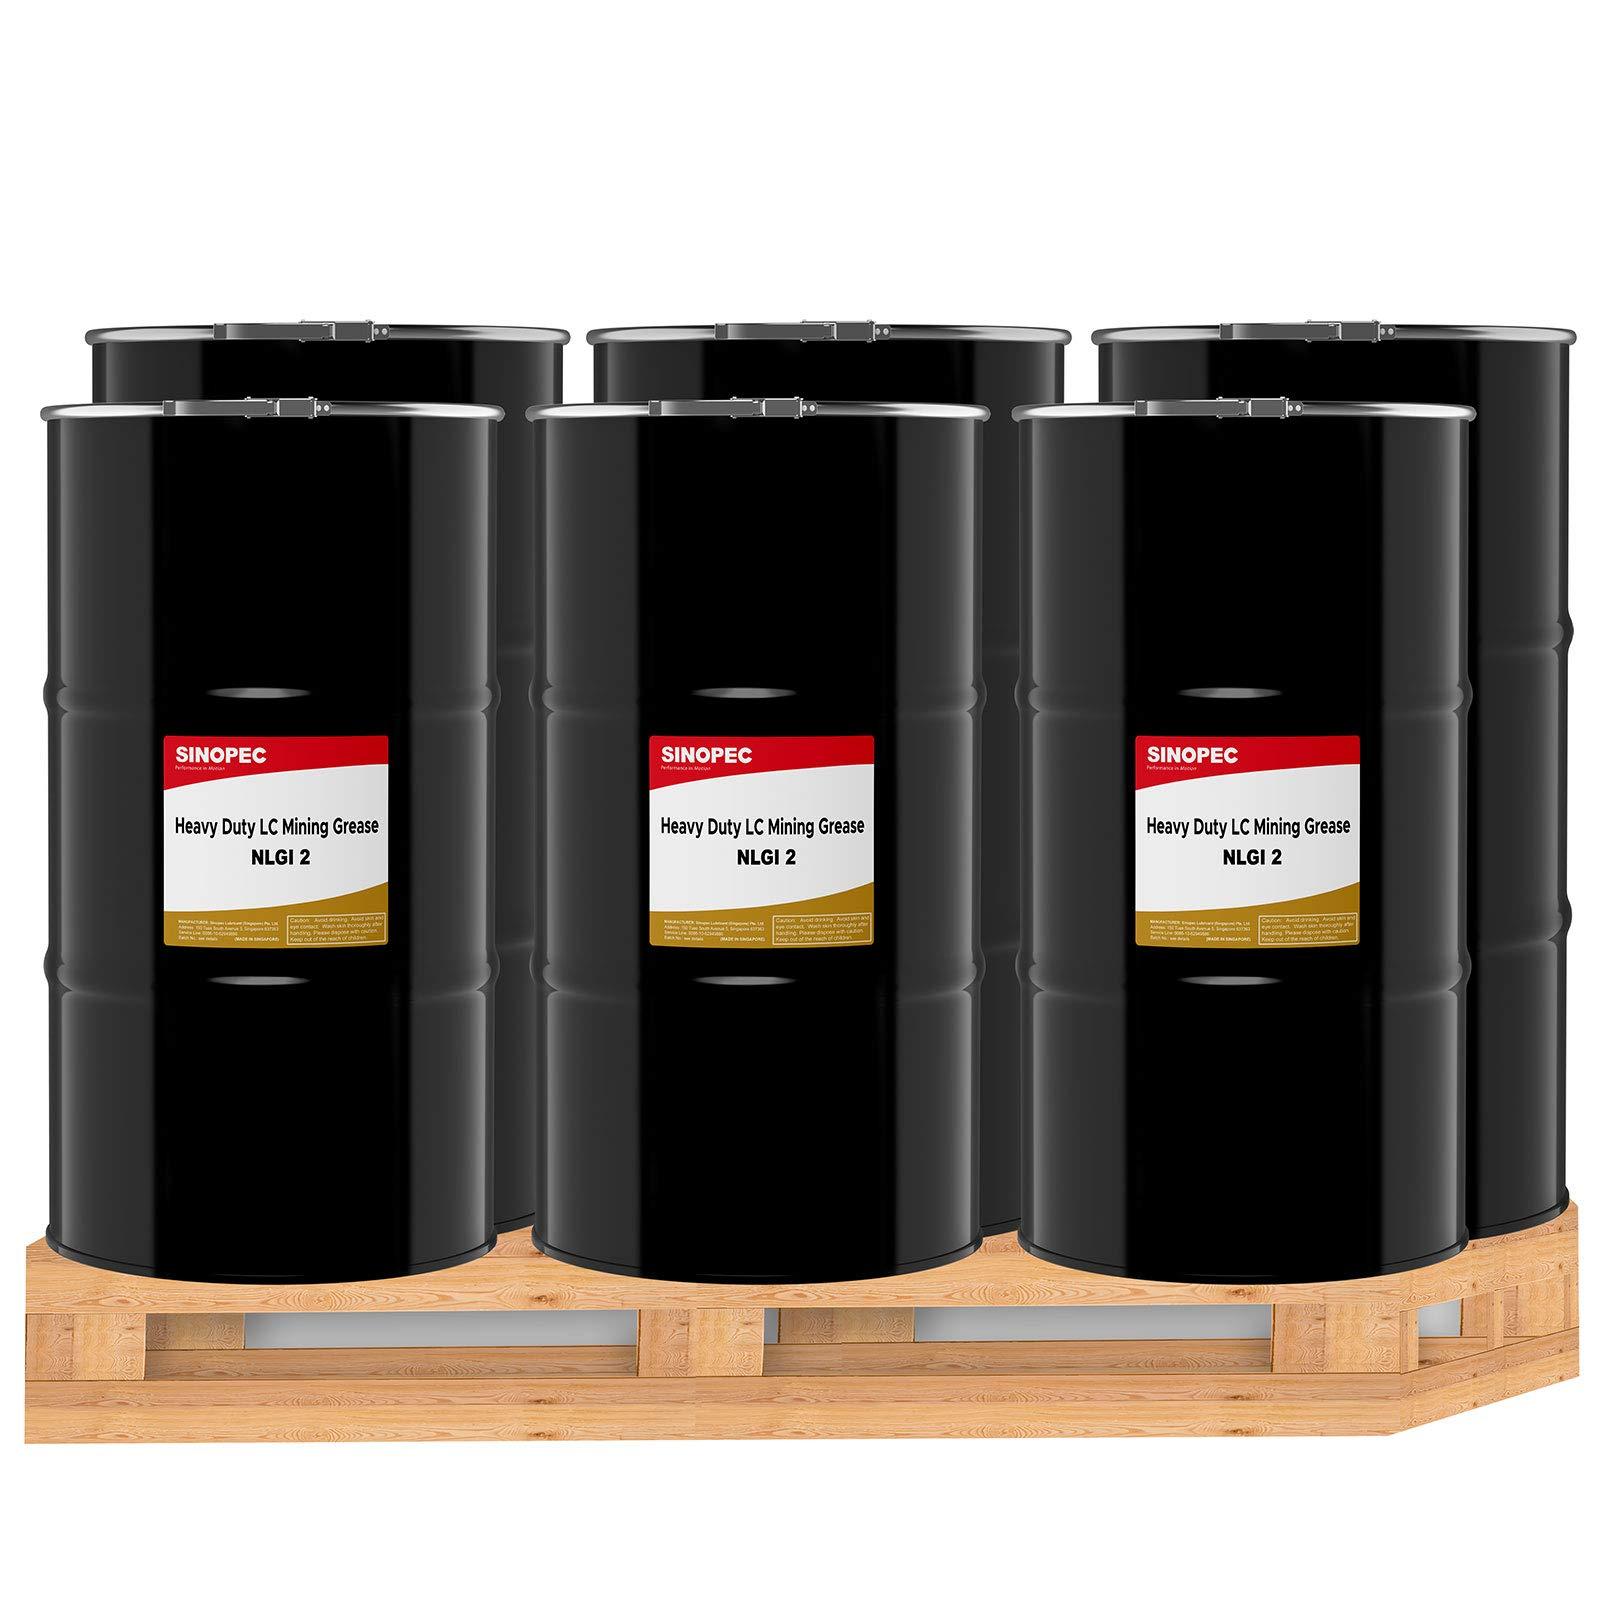 Sinopec Moly 5% EP High Temp Lithium Complex Grease, NLGI 2 - (6) 120LB. (16 Gallon) Kegs